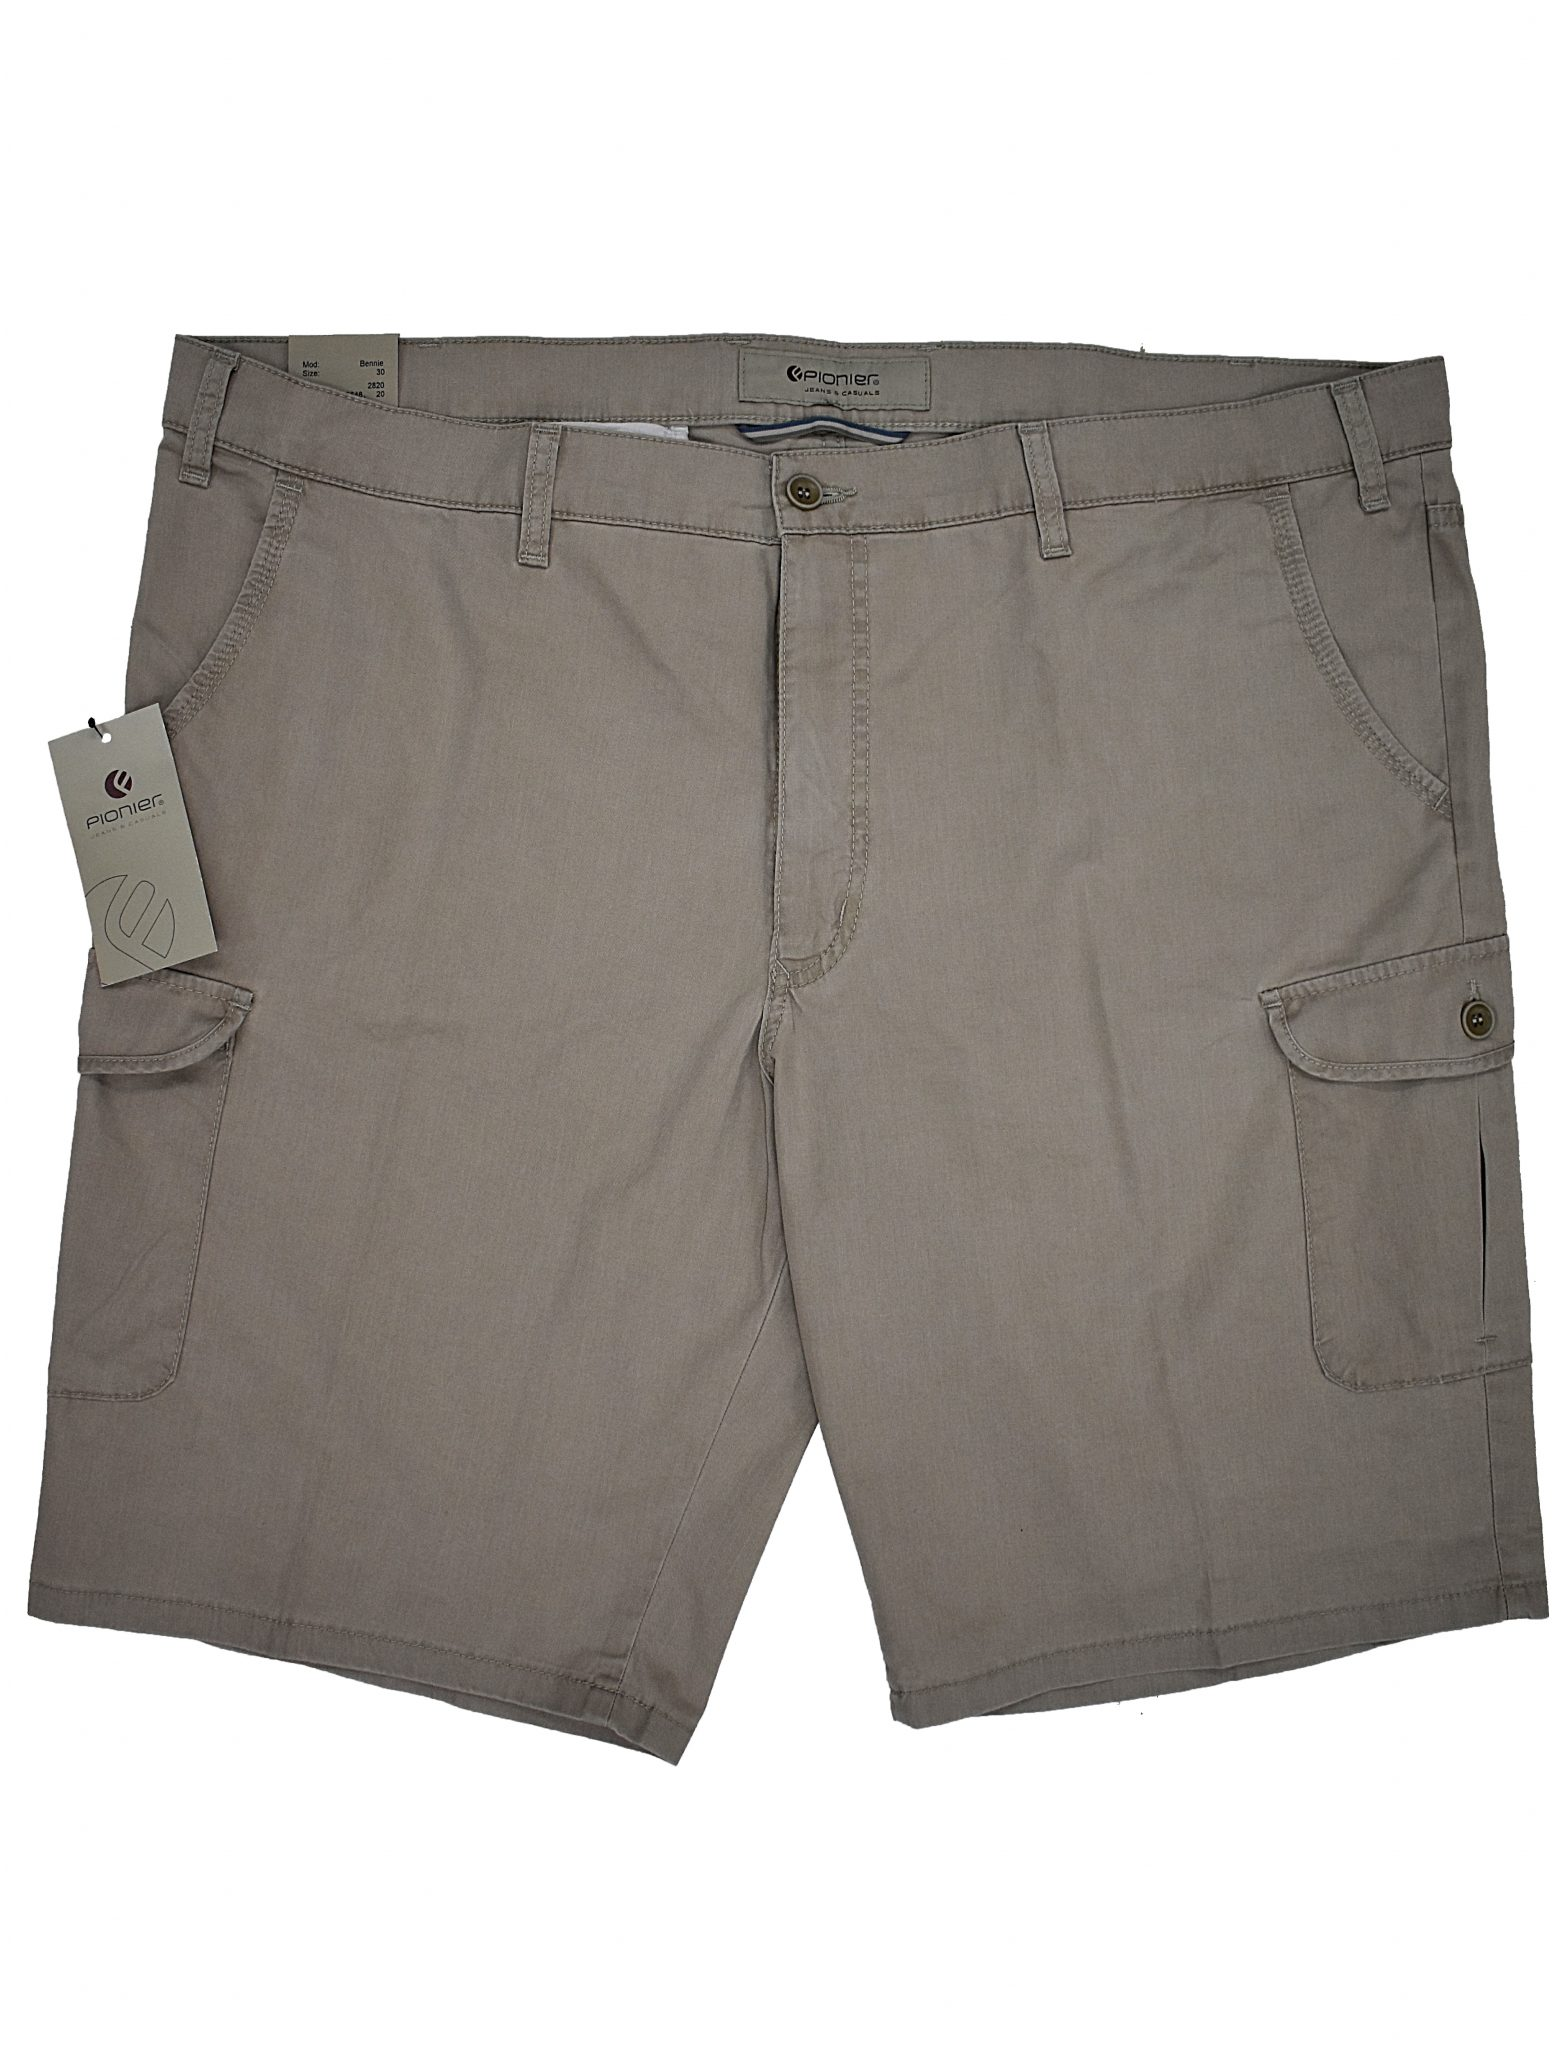 Pionier grote maat korte broek beige model Bennie